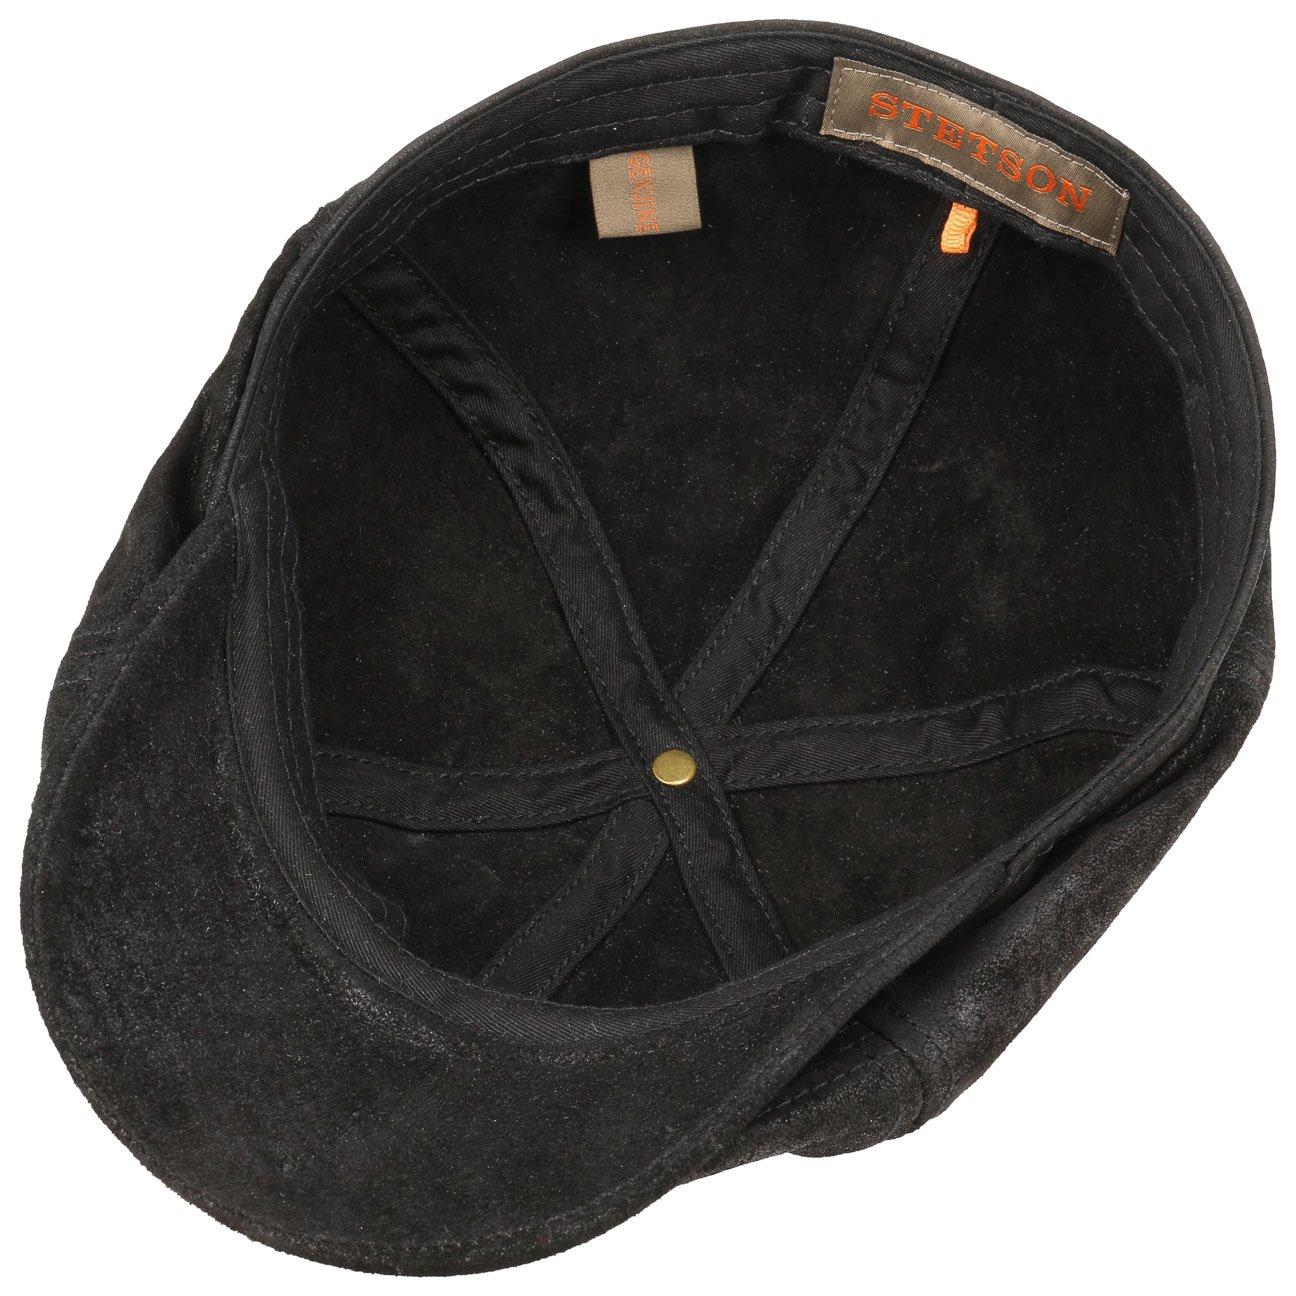 Stetson Lanesboro Leather Flat Cap antique  Amazon.co.uk  Clothing 02c0e2e3abfb